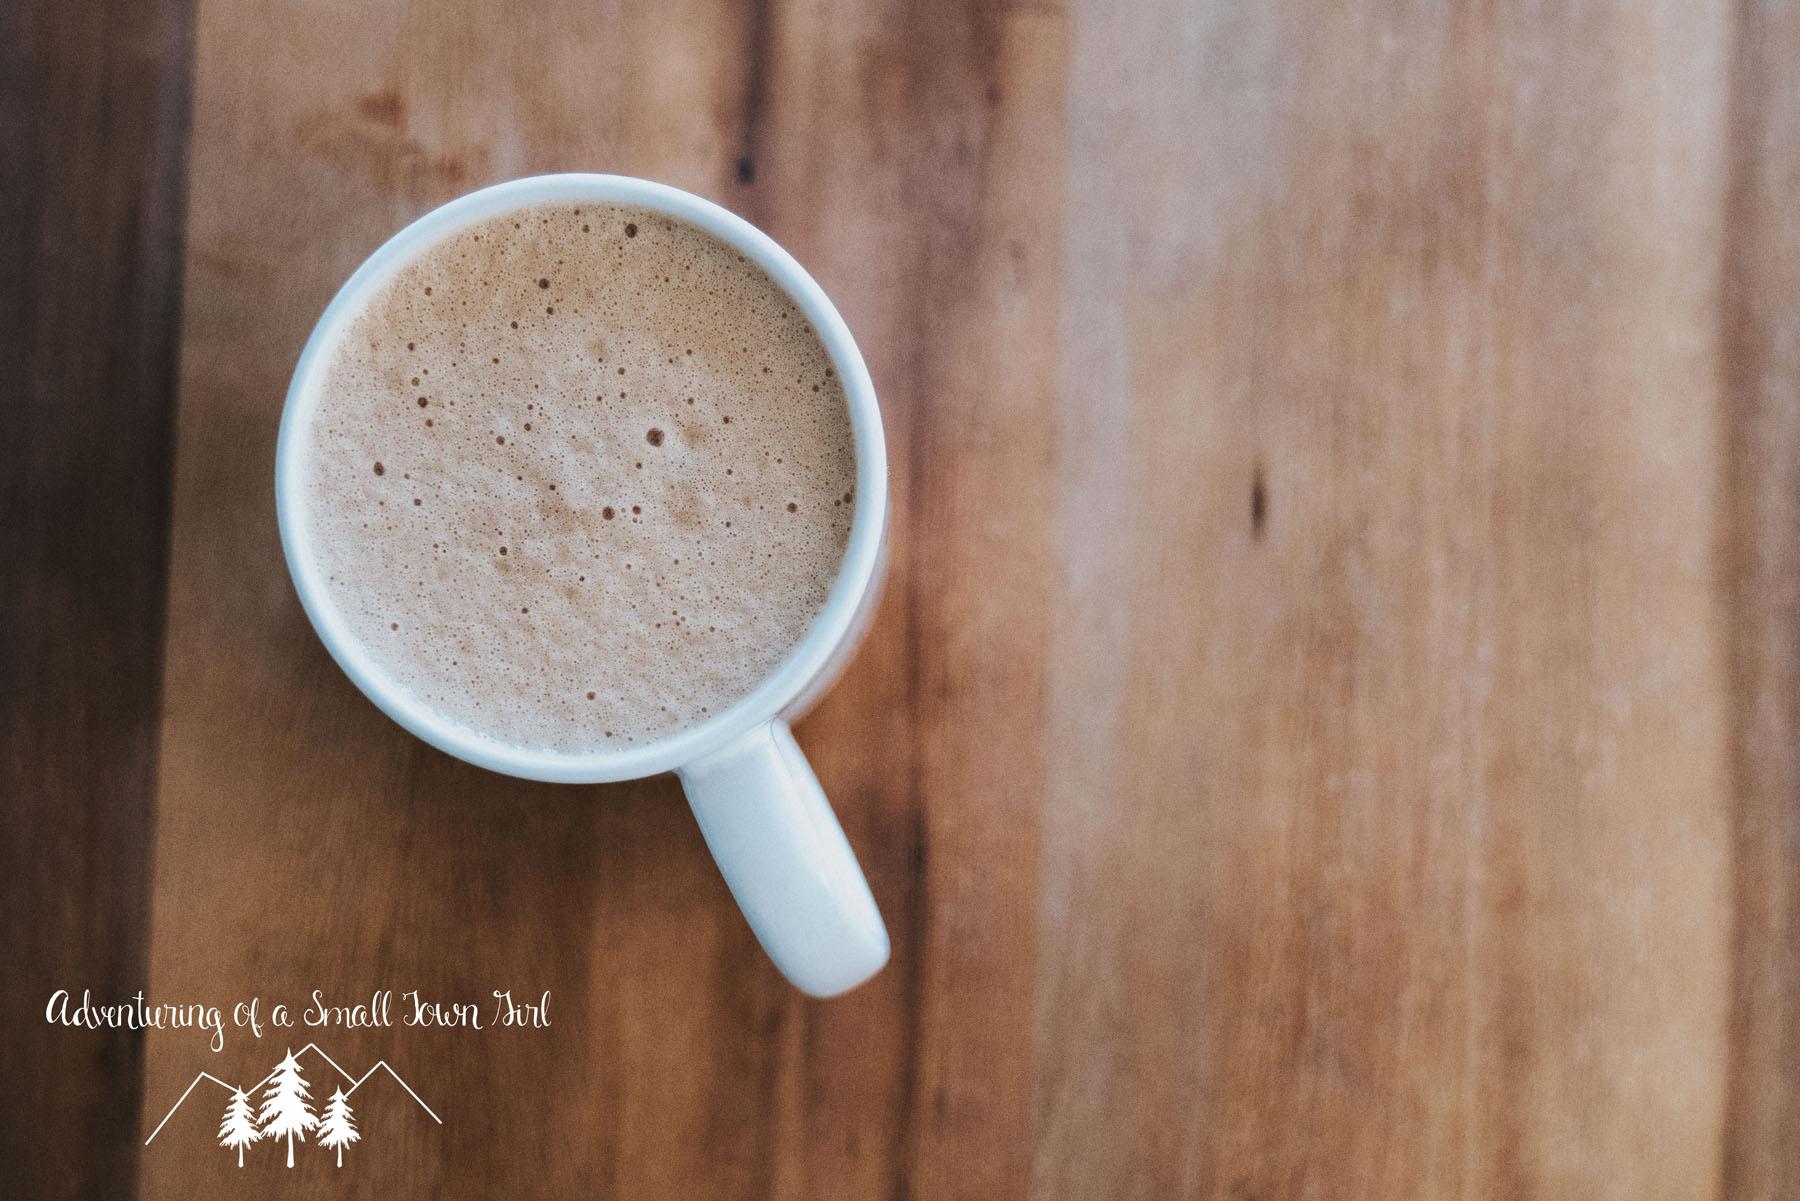 Healthy Latte Recipe - Starbucks Hack - Adventuring of a Small Town Girl-13.jpg